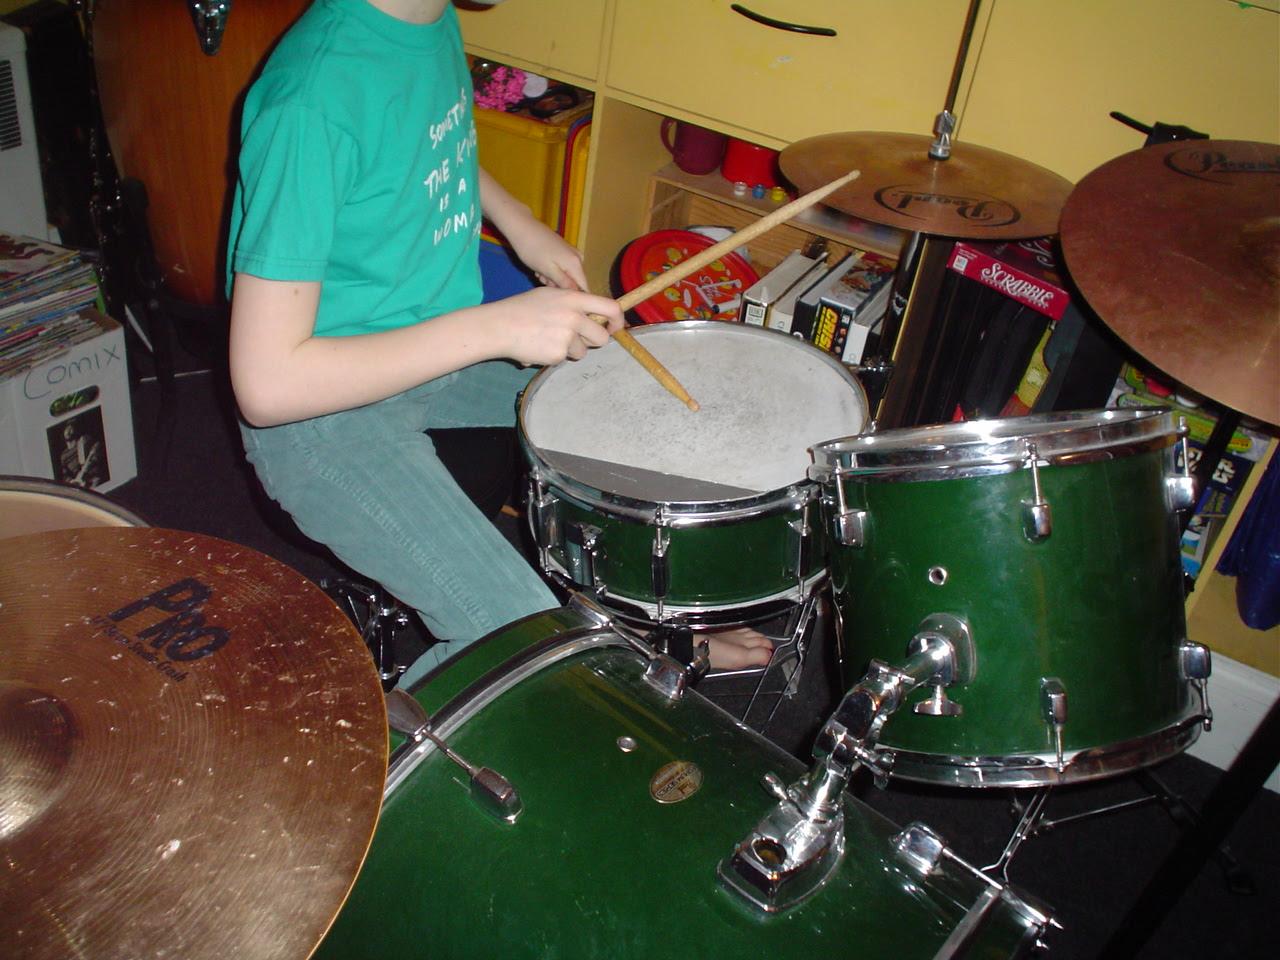 GRETA on the drumsssss